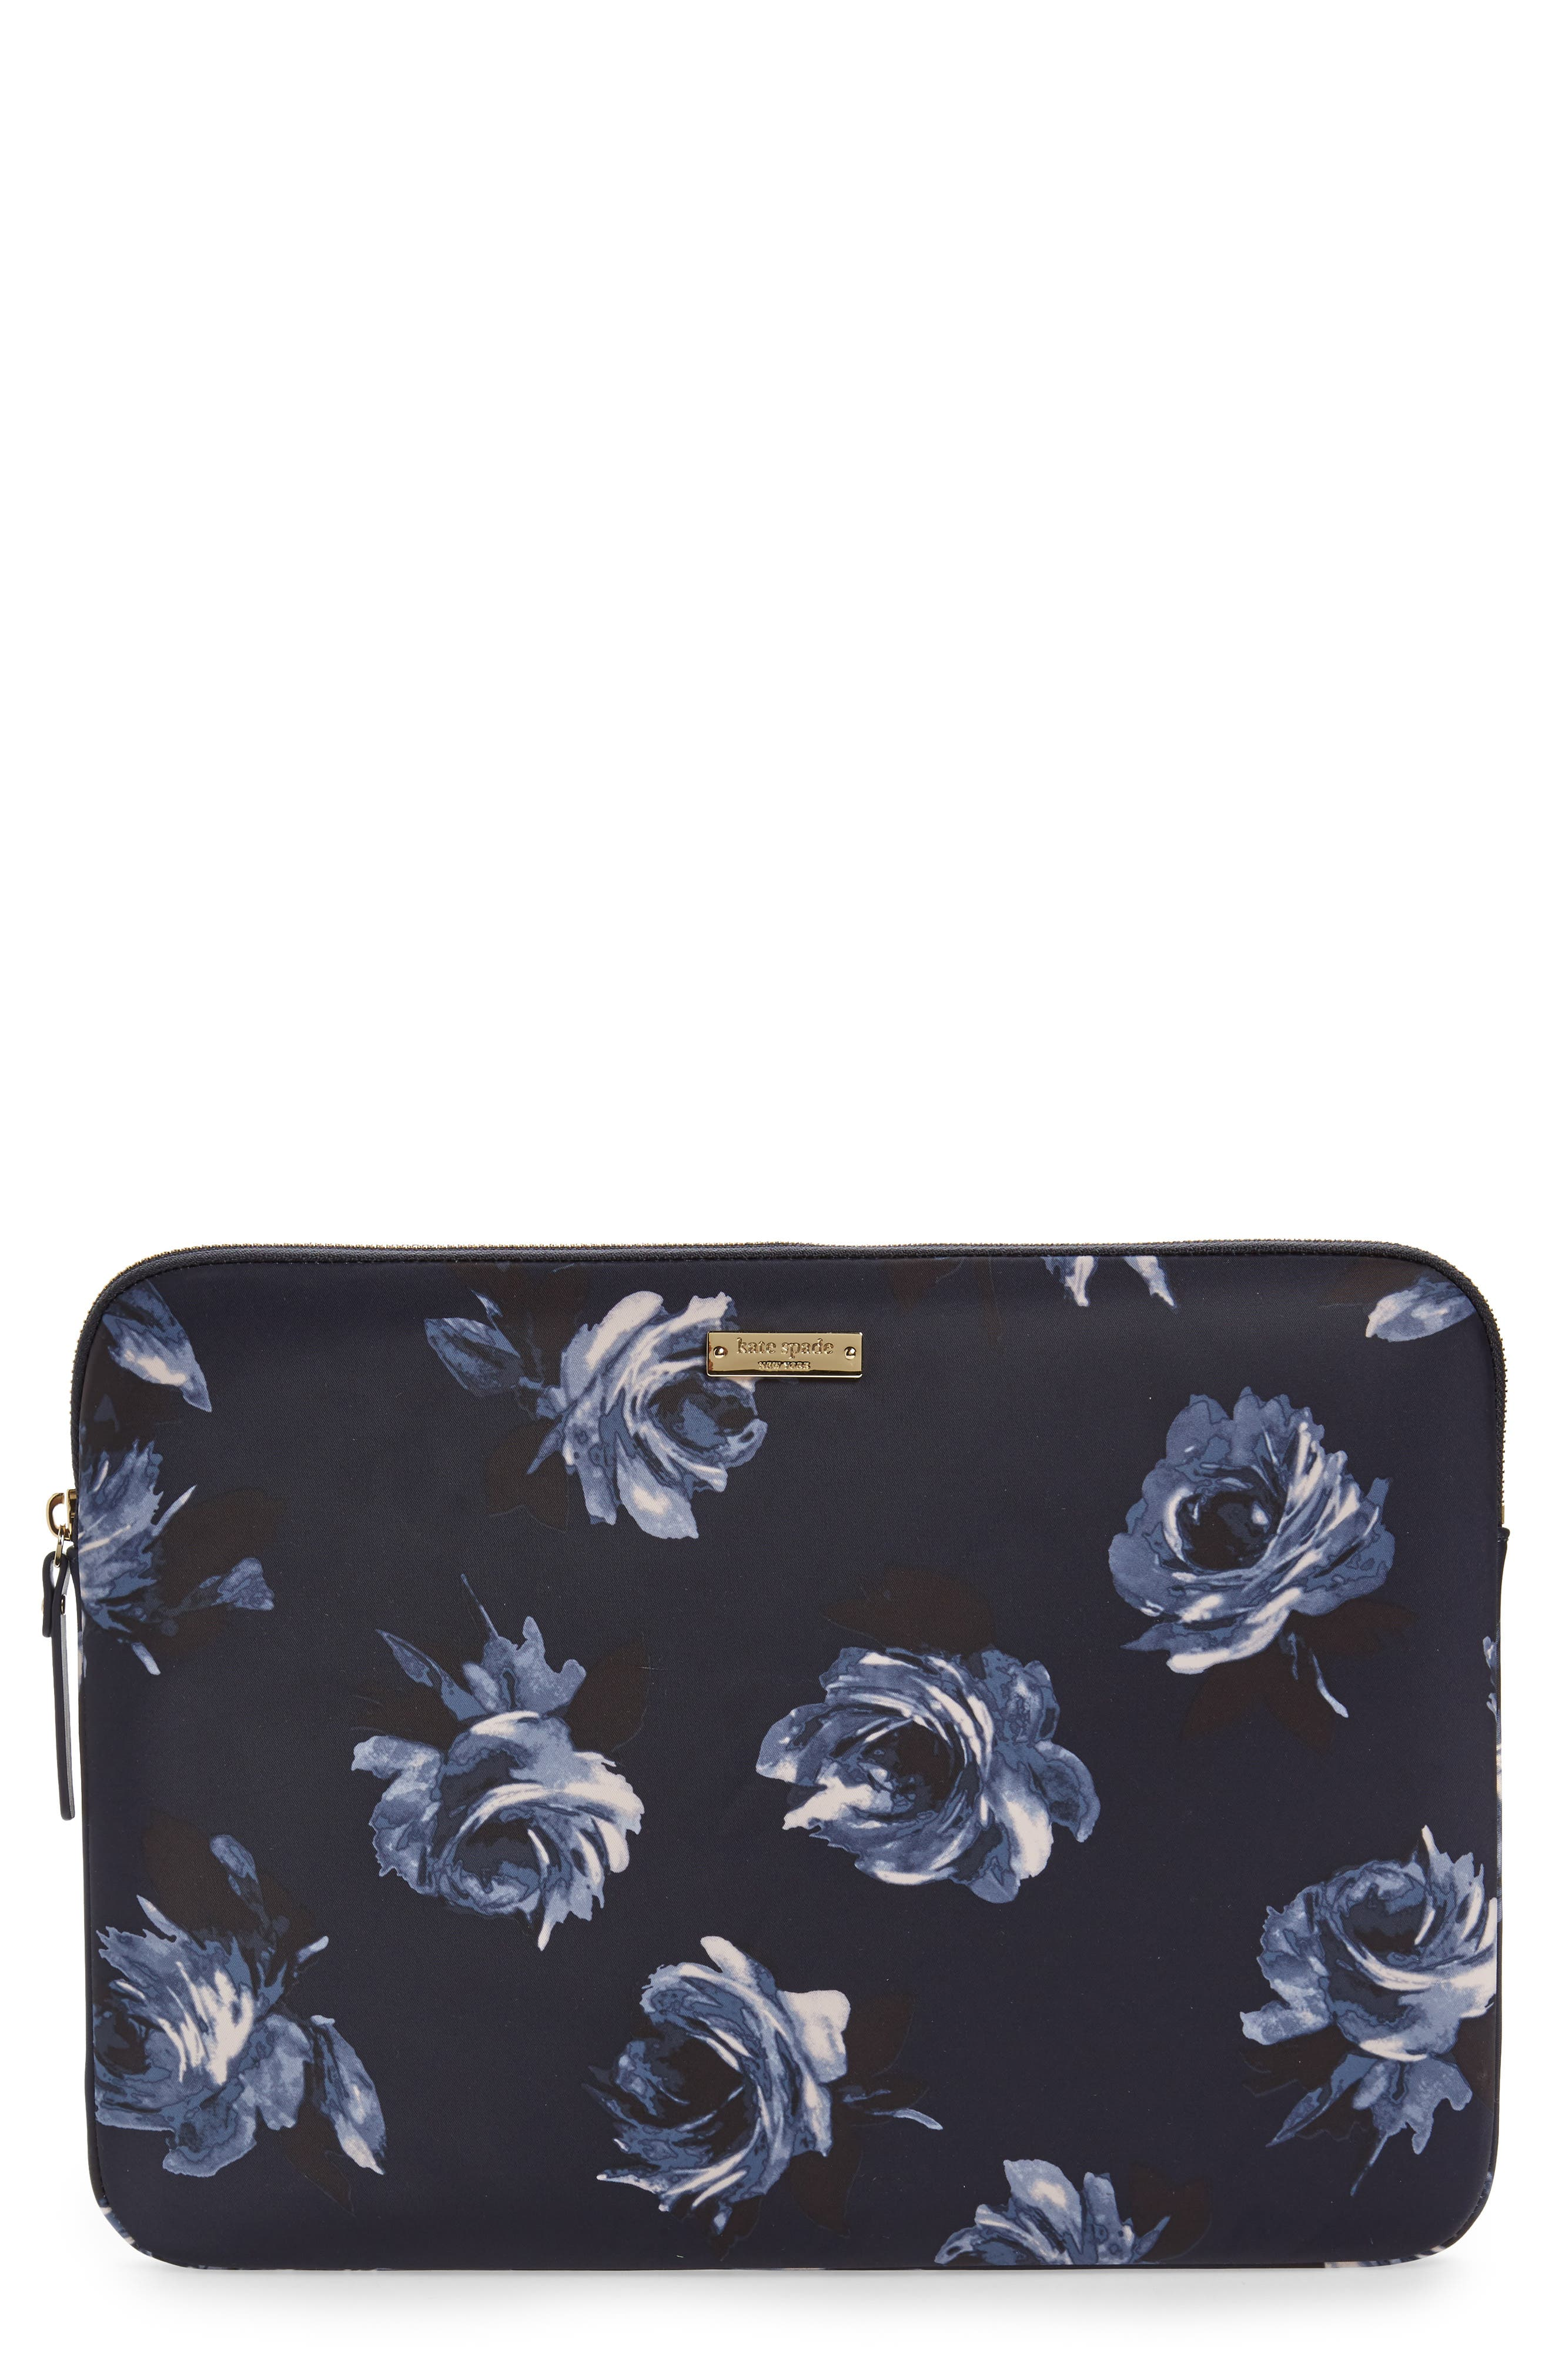 kate spade new york night rose 13-Inch laptop sleeve